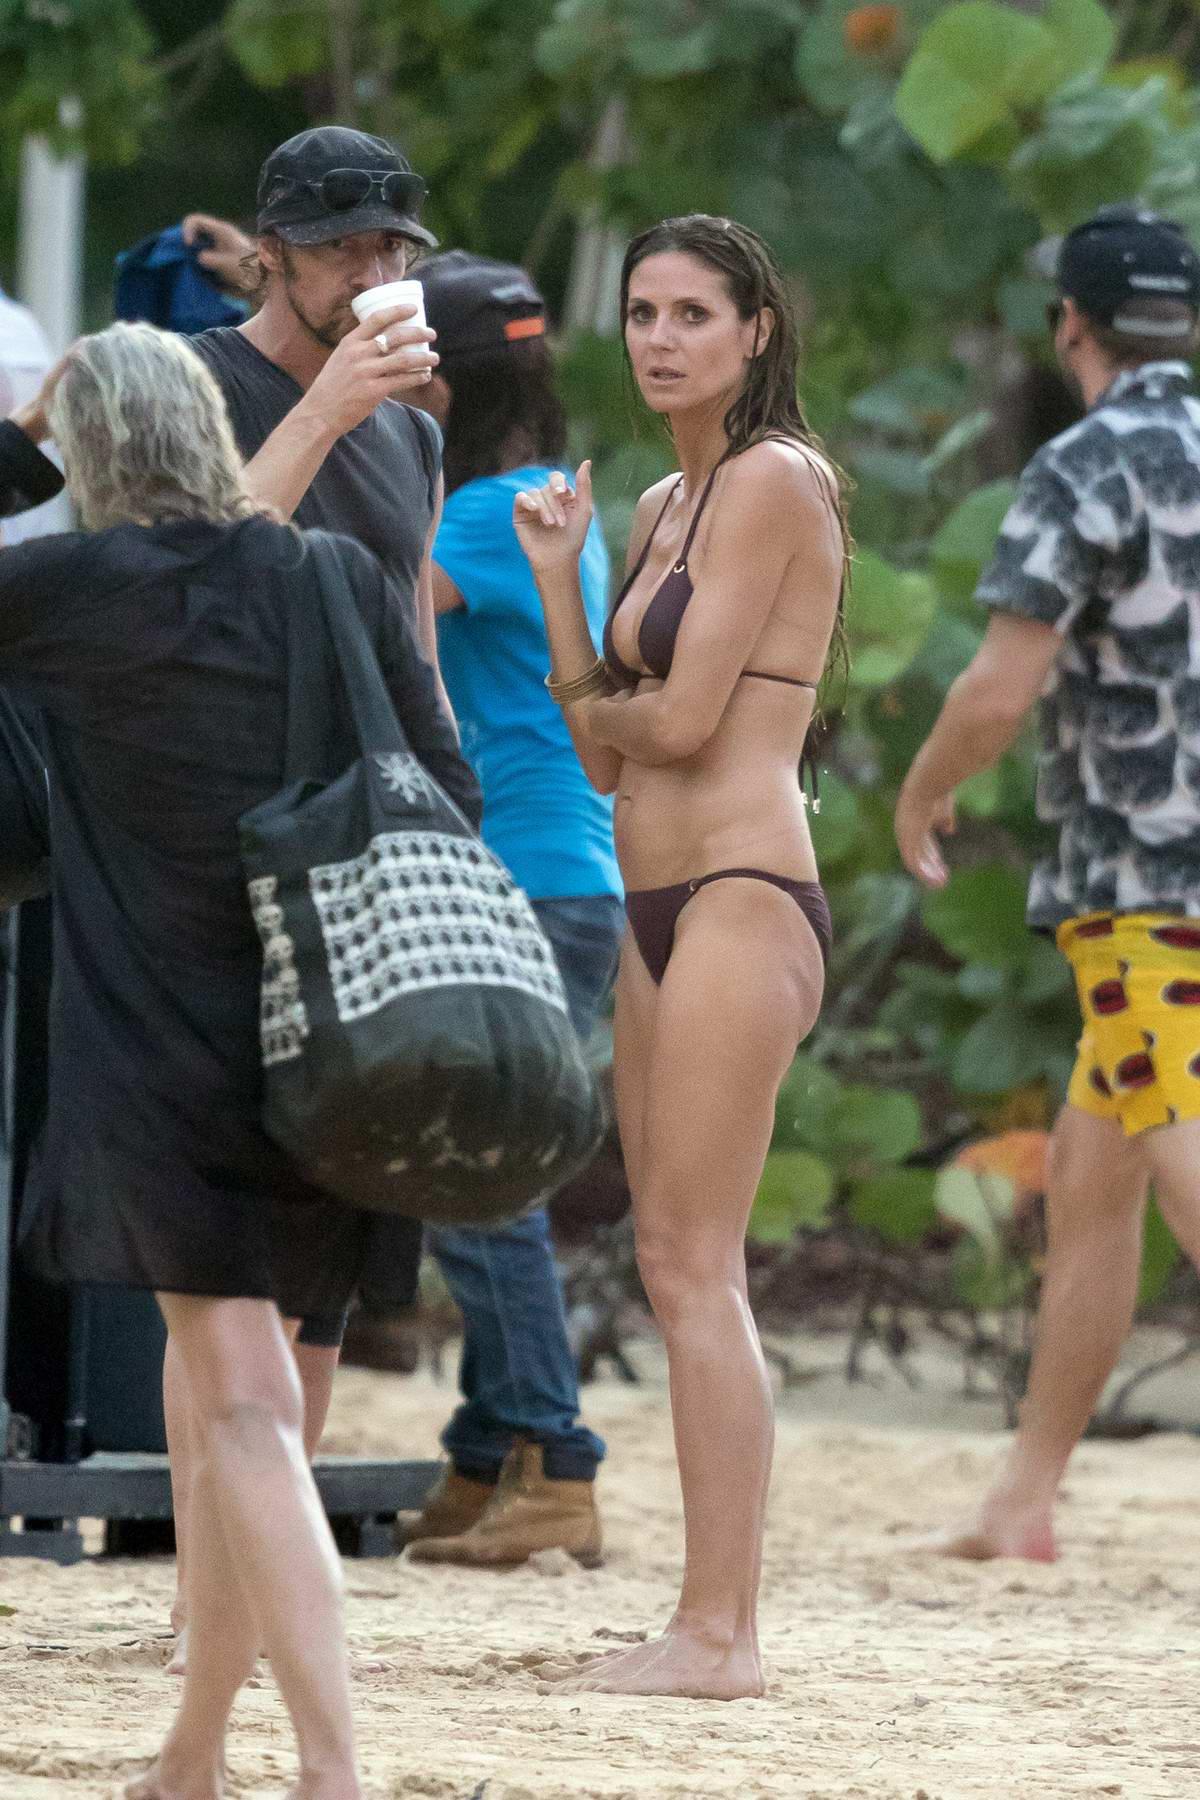 f4ecd1ac84 heidi klum in a bikini parties on the beach as germany s next top ...